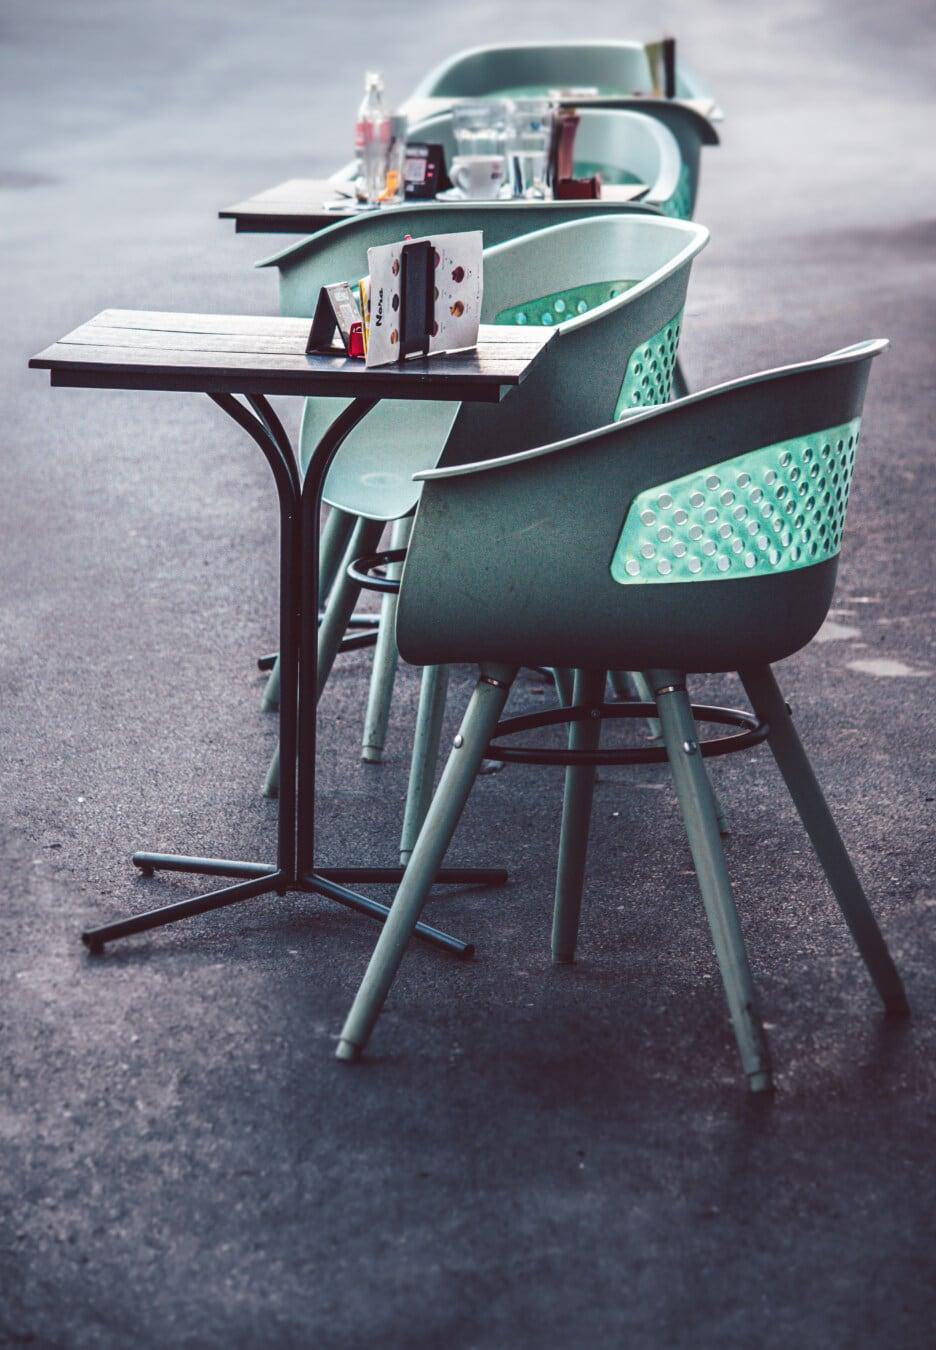 Restaurant, Pandemie, leere, Stuhl, Möbel, Tabelle, Sitz, Jahrgang, Straße, im freien